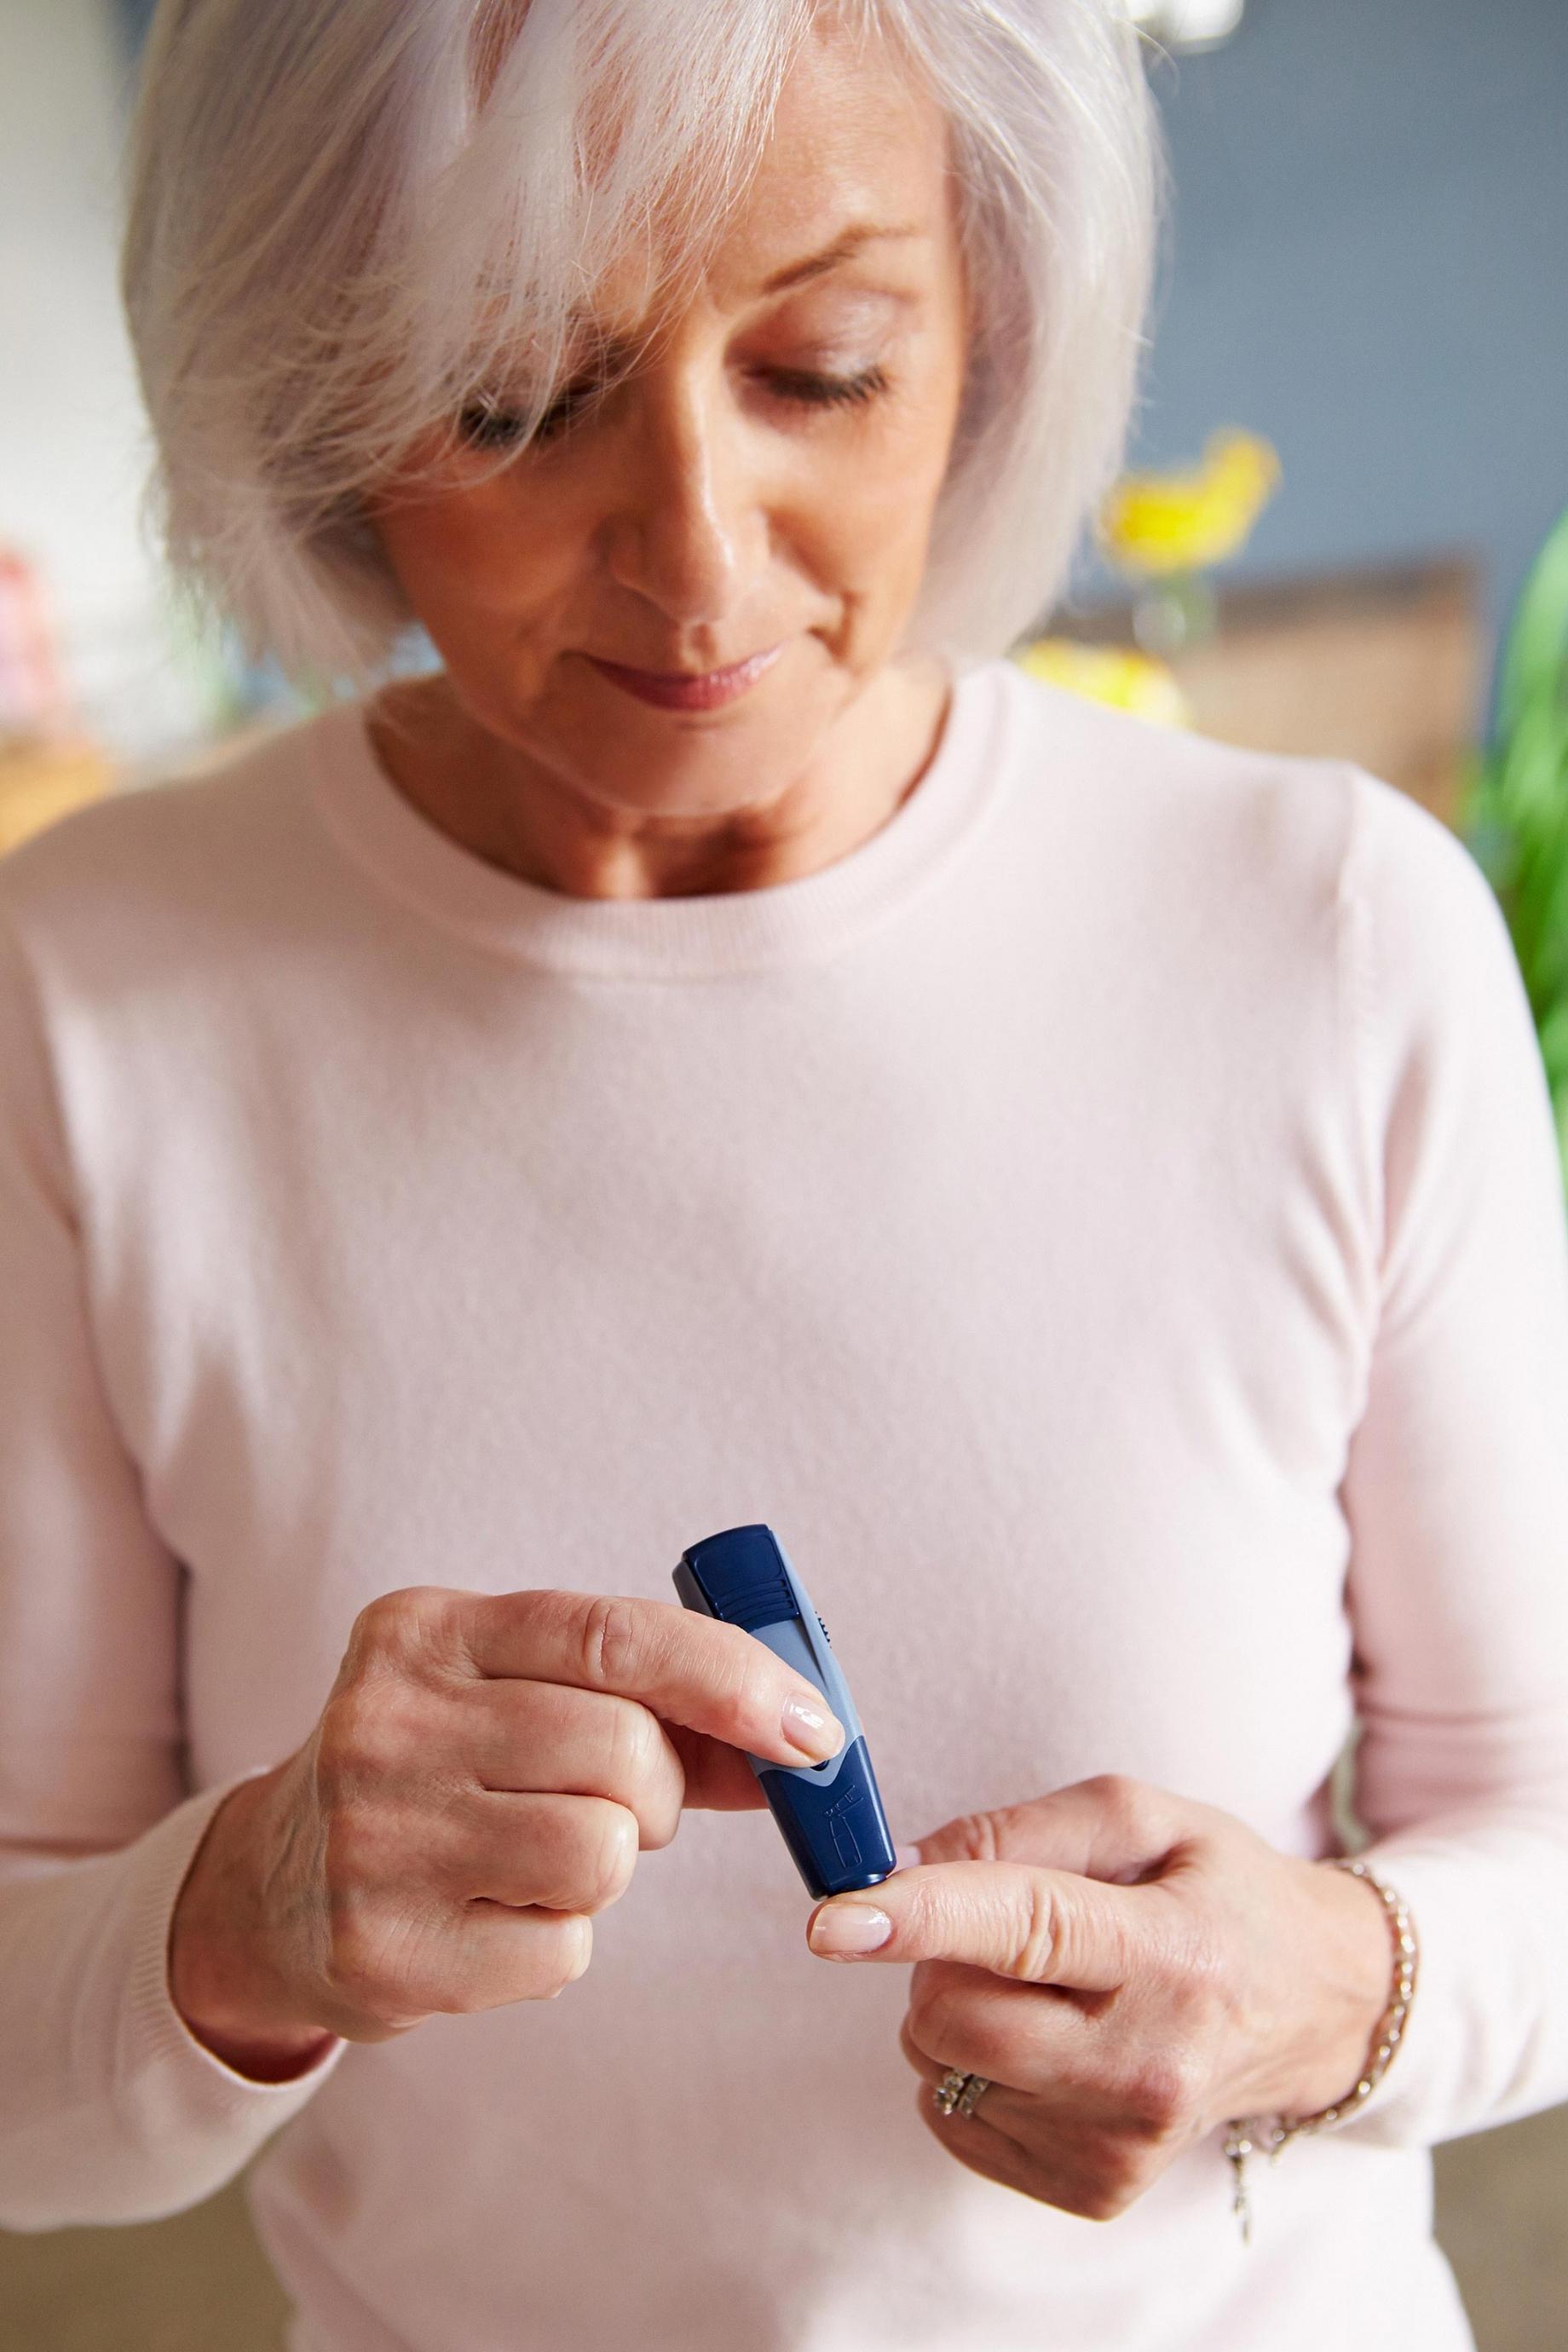 Woman checking blood sugar levels